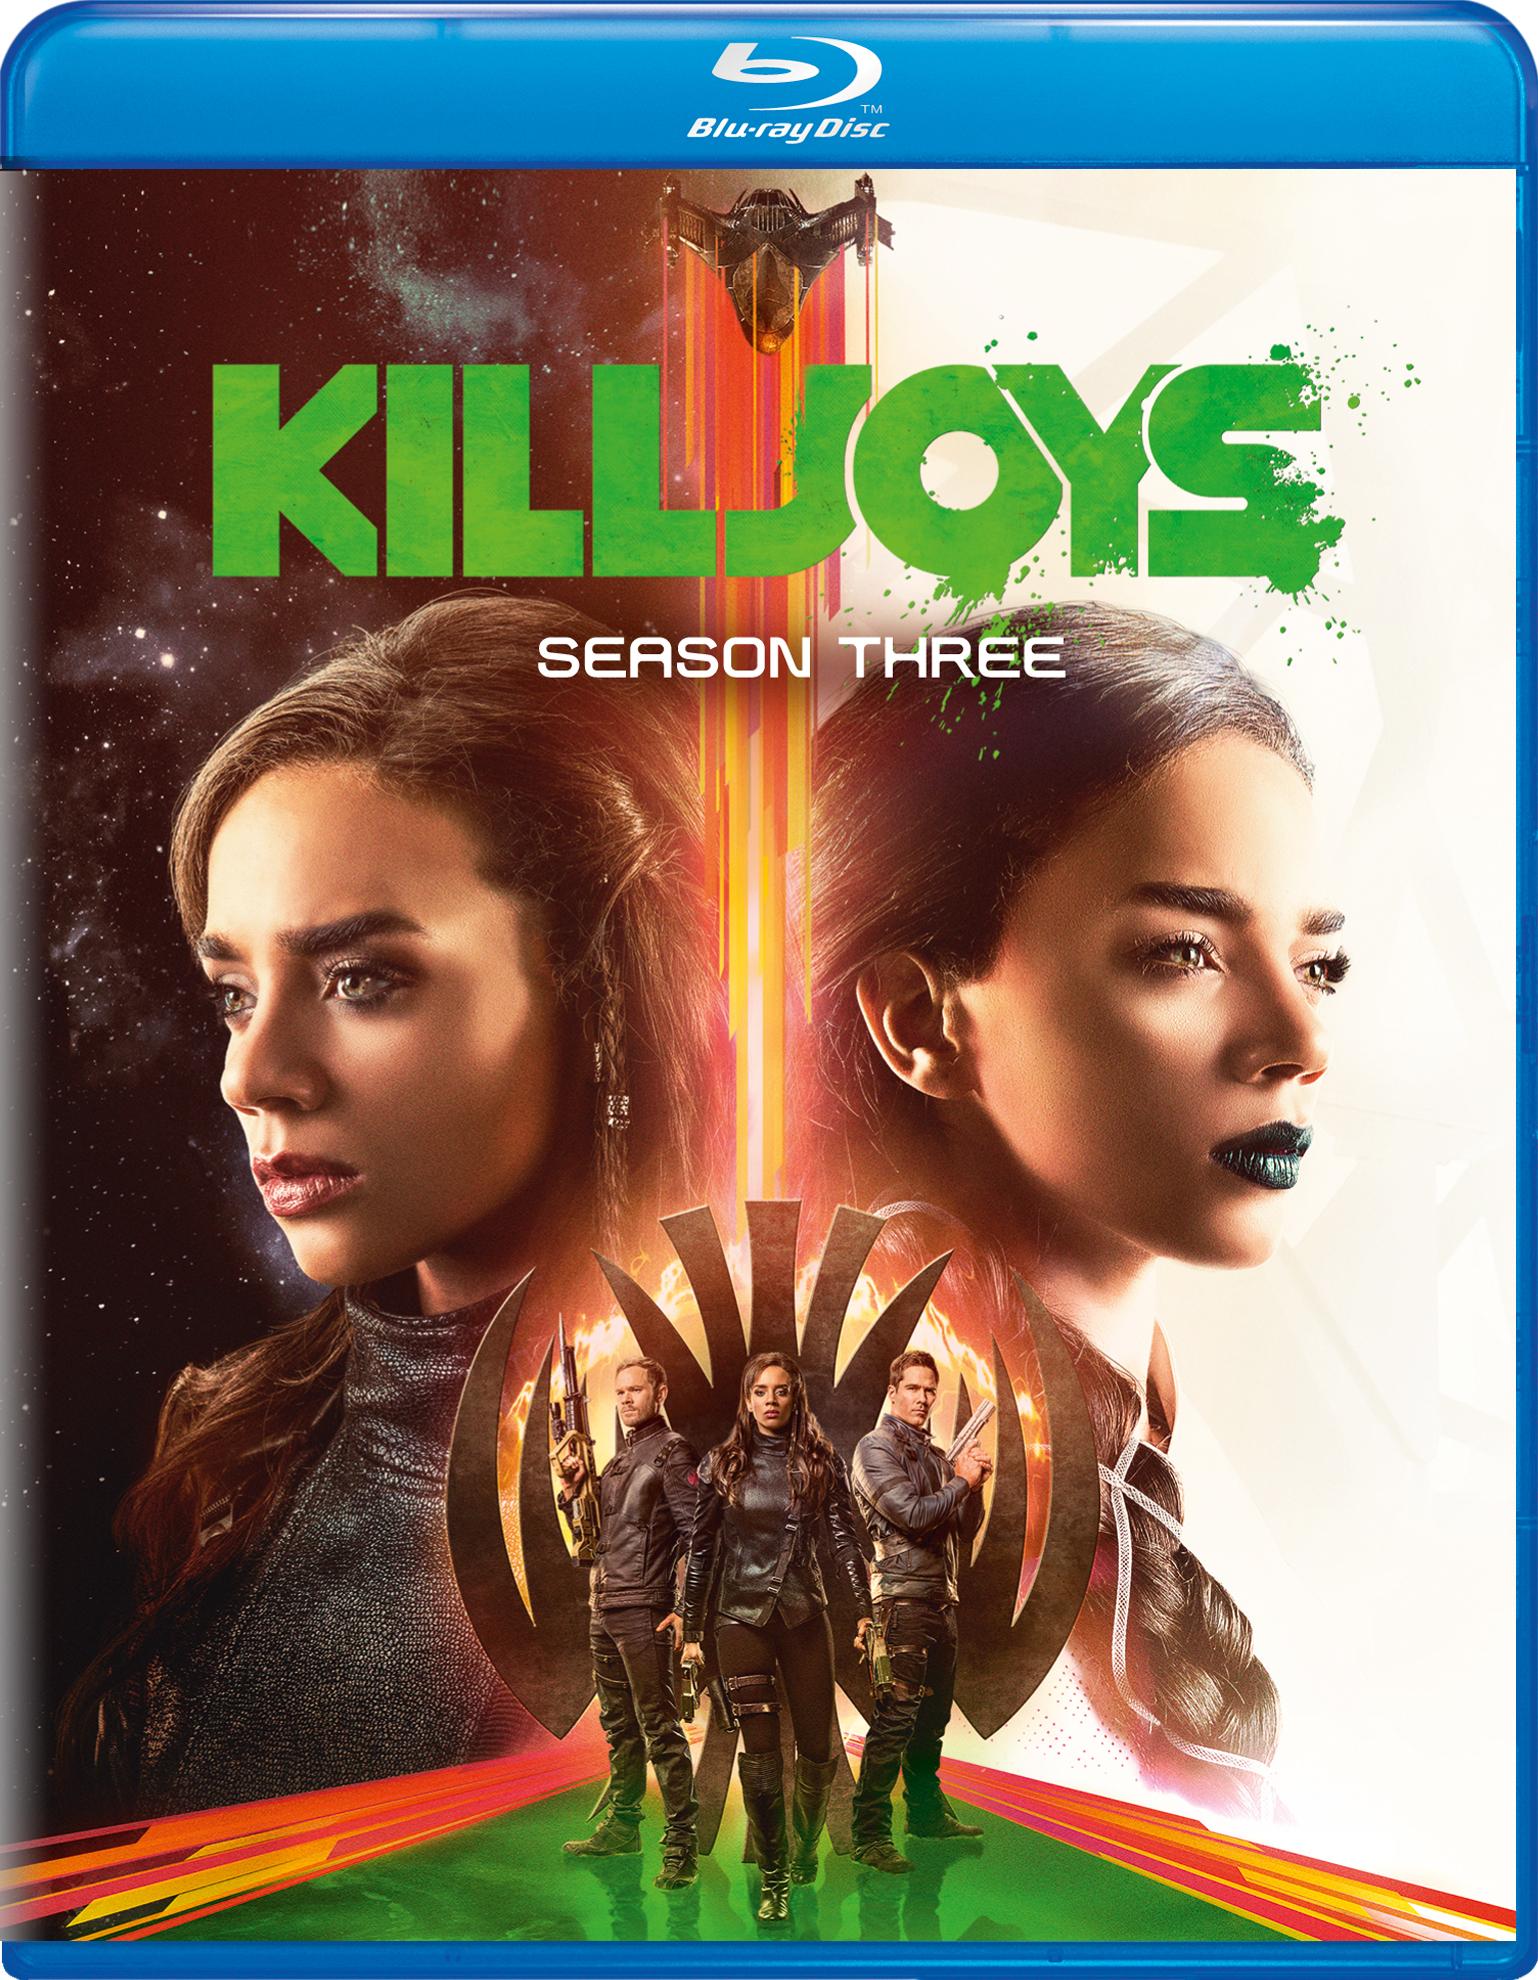 Killjoys: Season Three (TV) (2017) Blu-ray